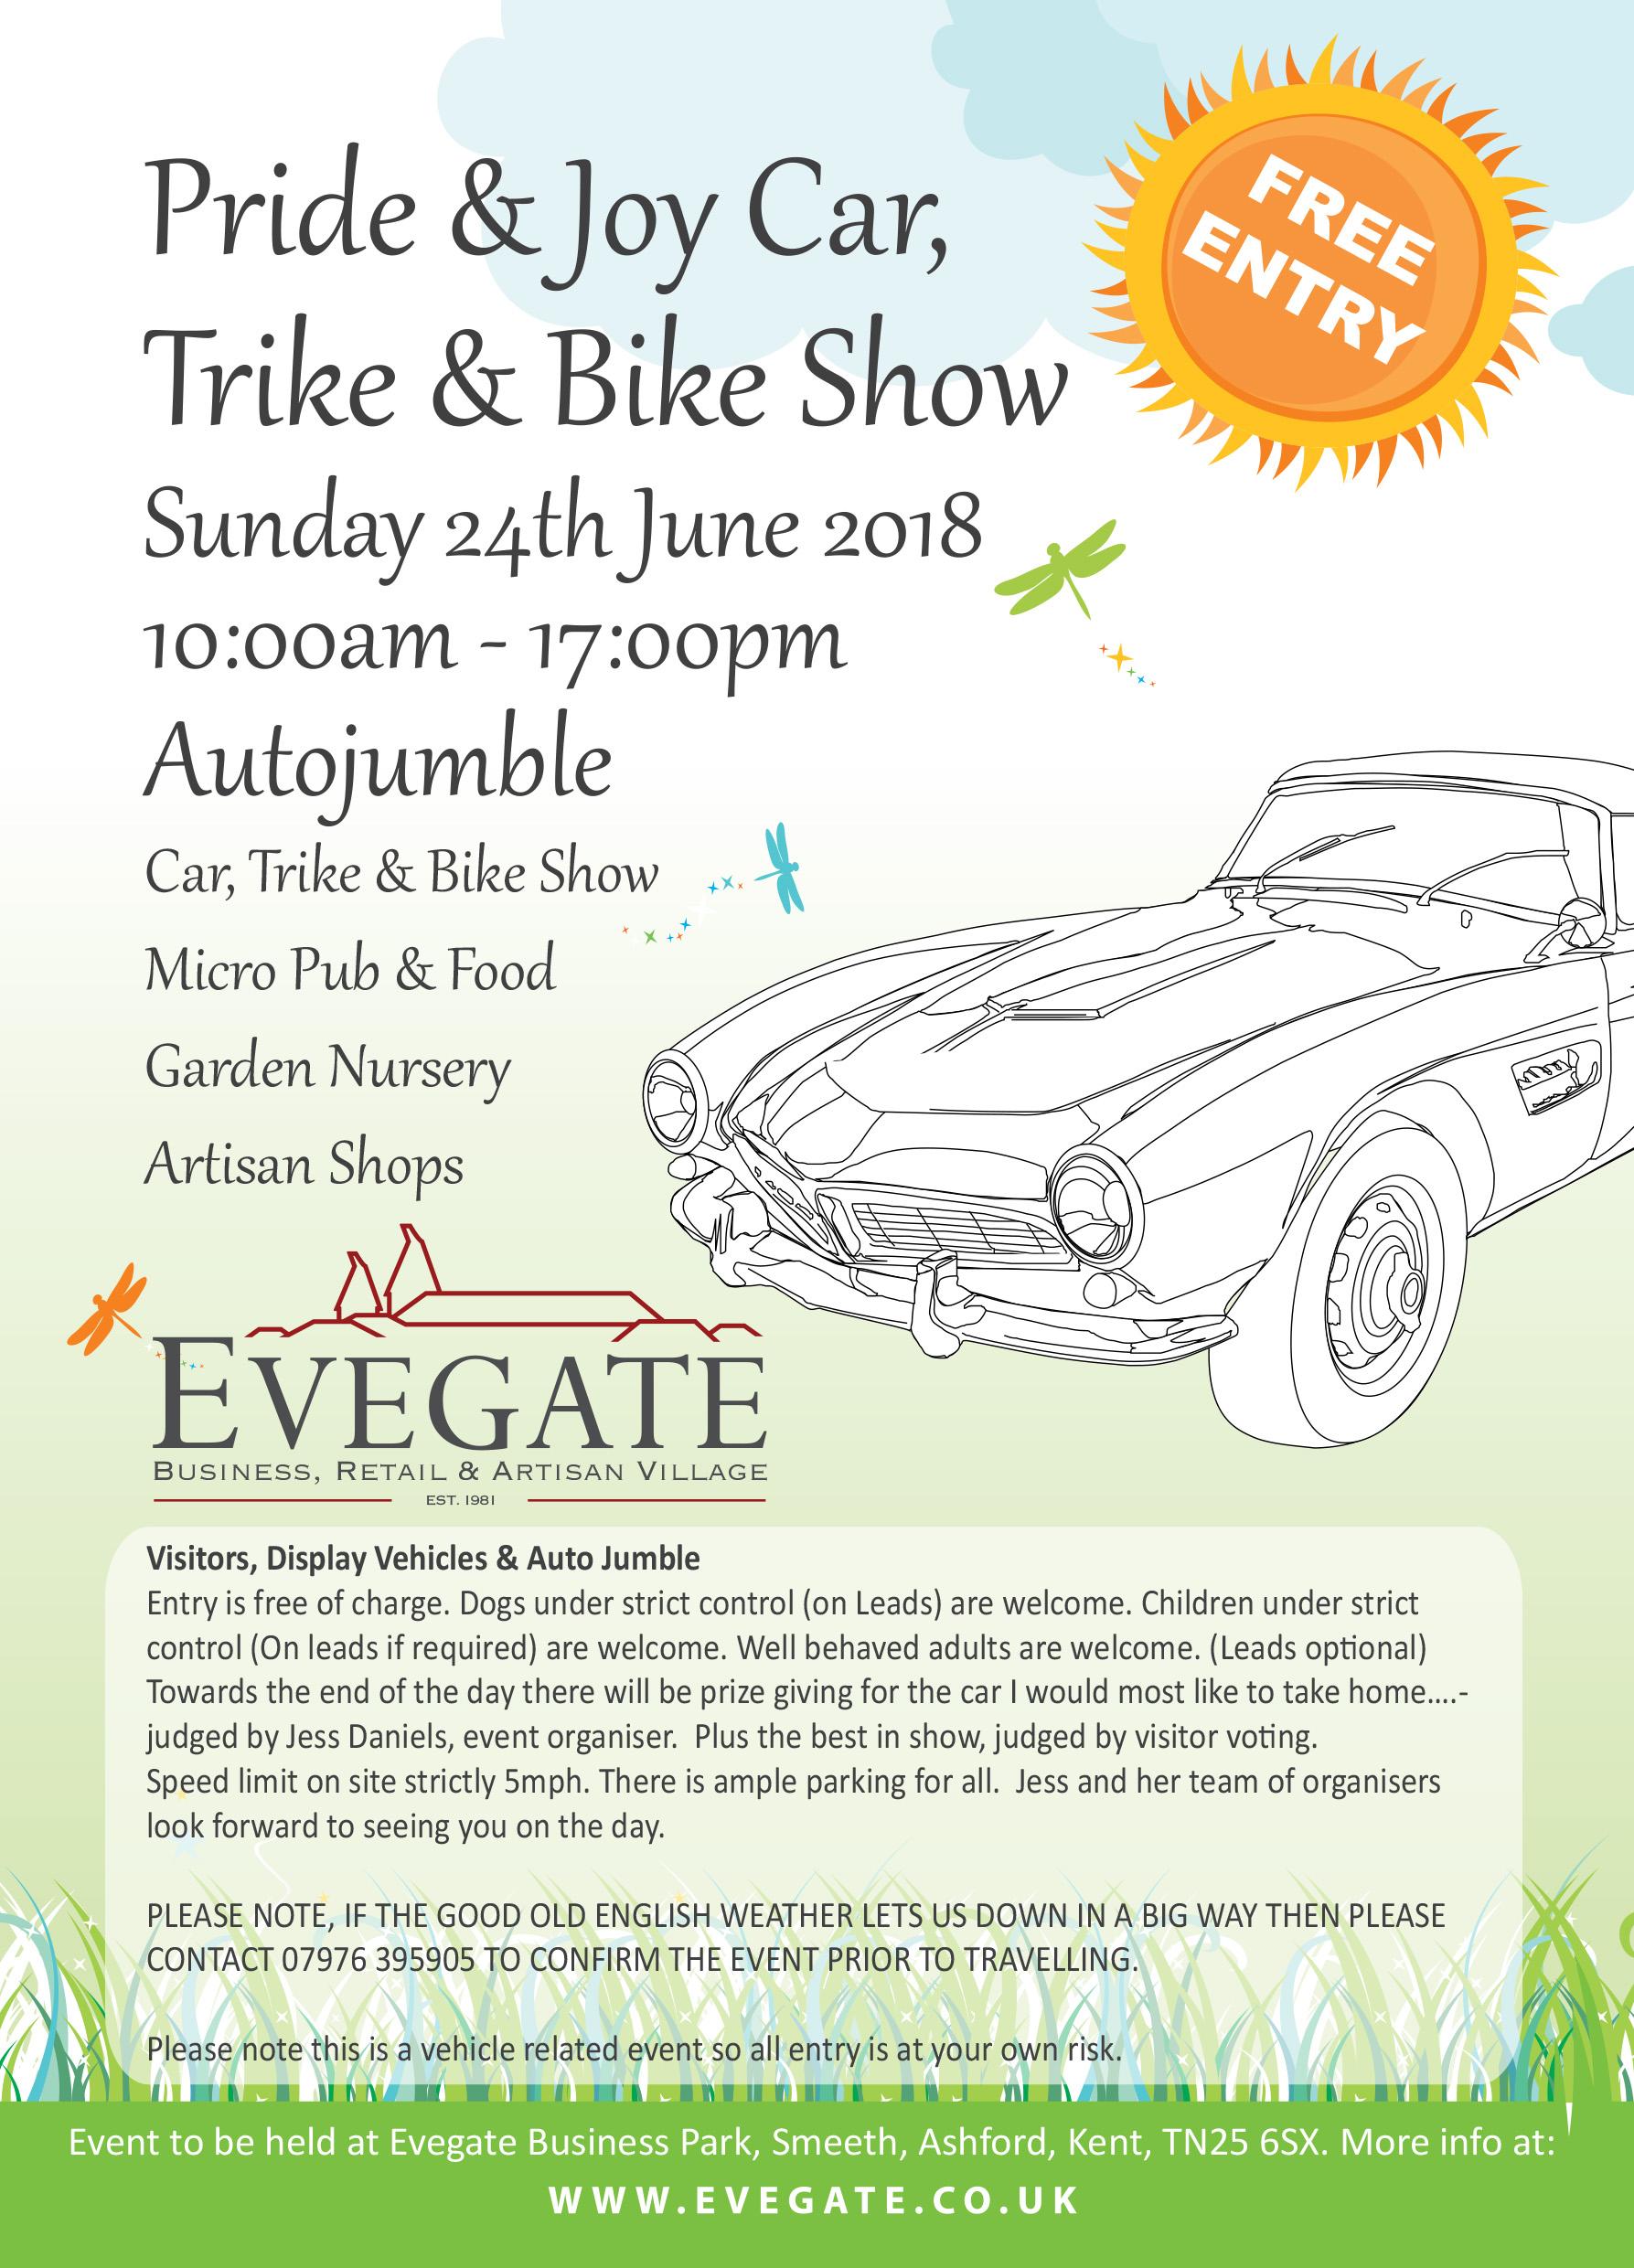 Pride & Joy Car, Trike & Bike Show – 24th June 2018